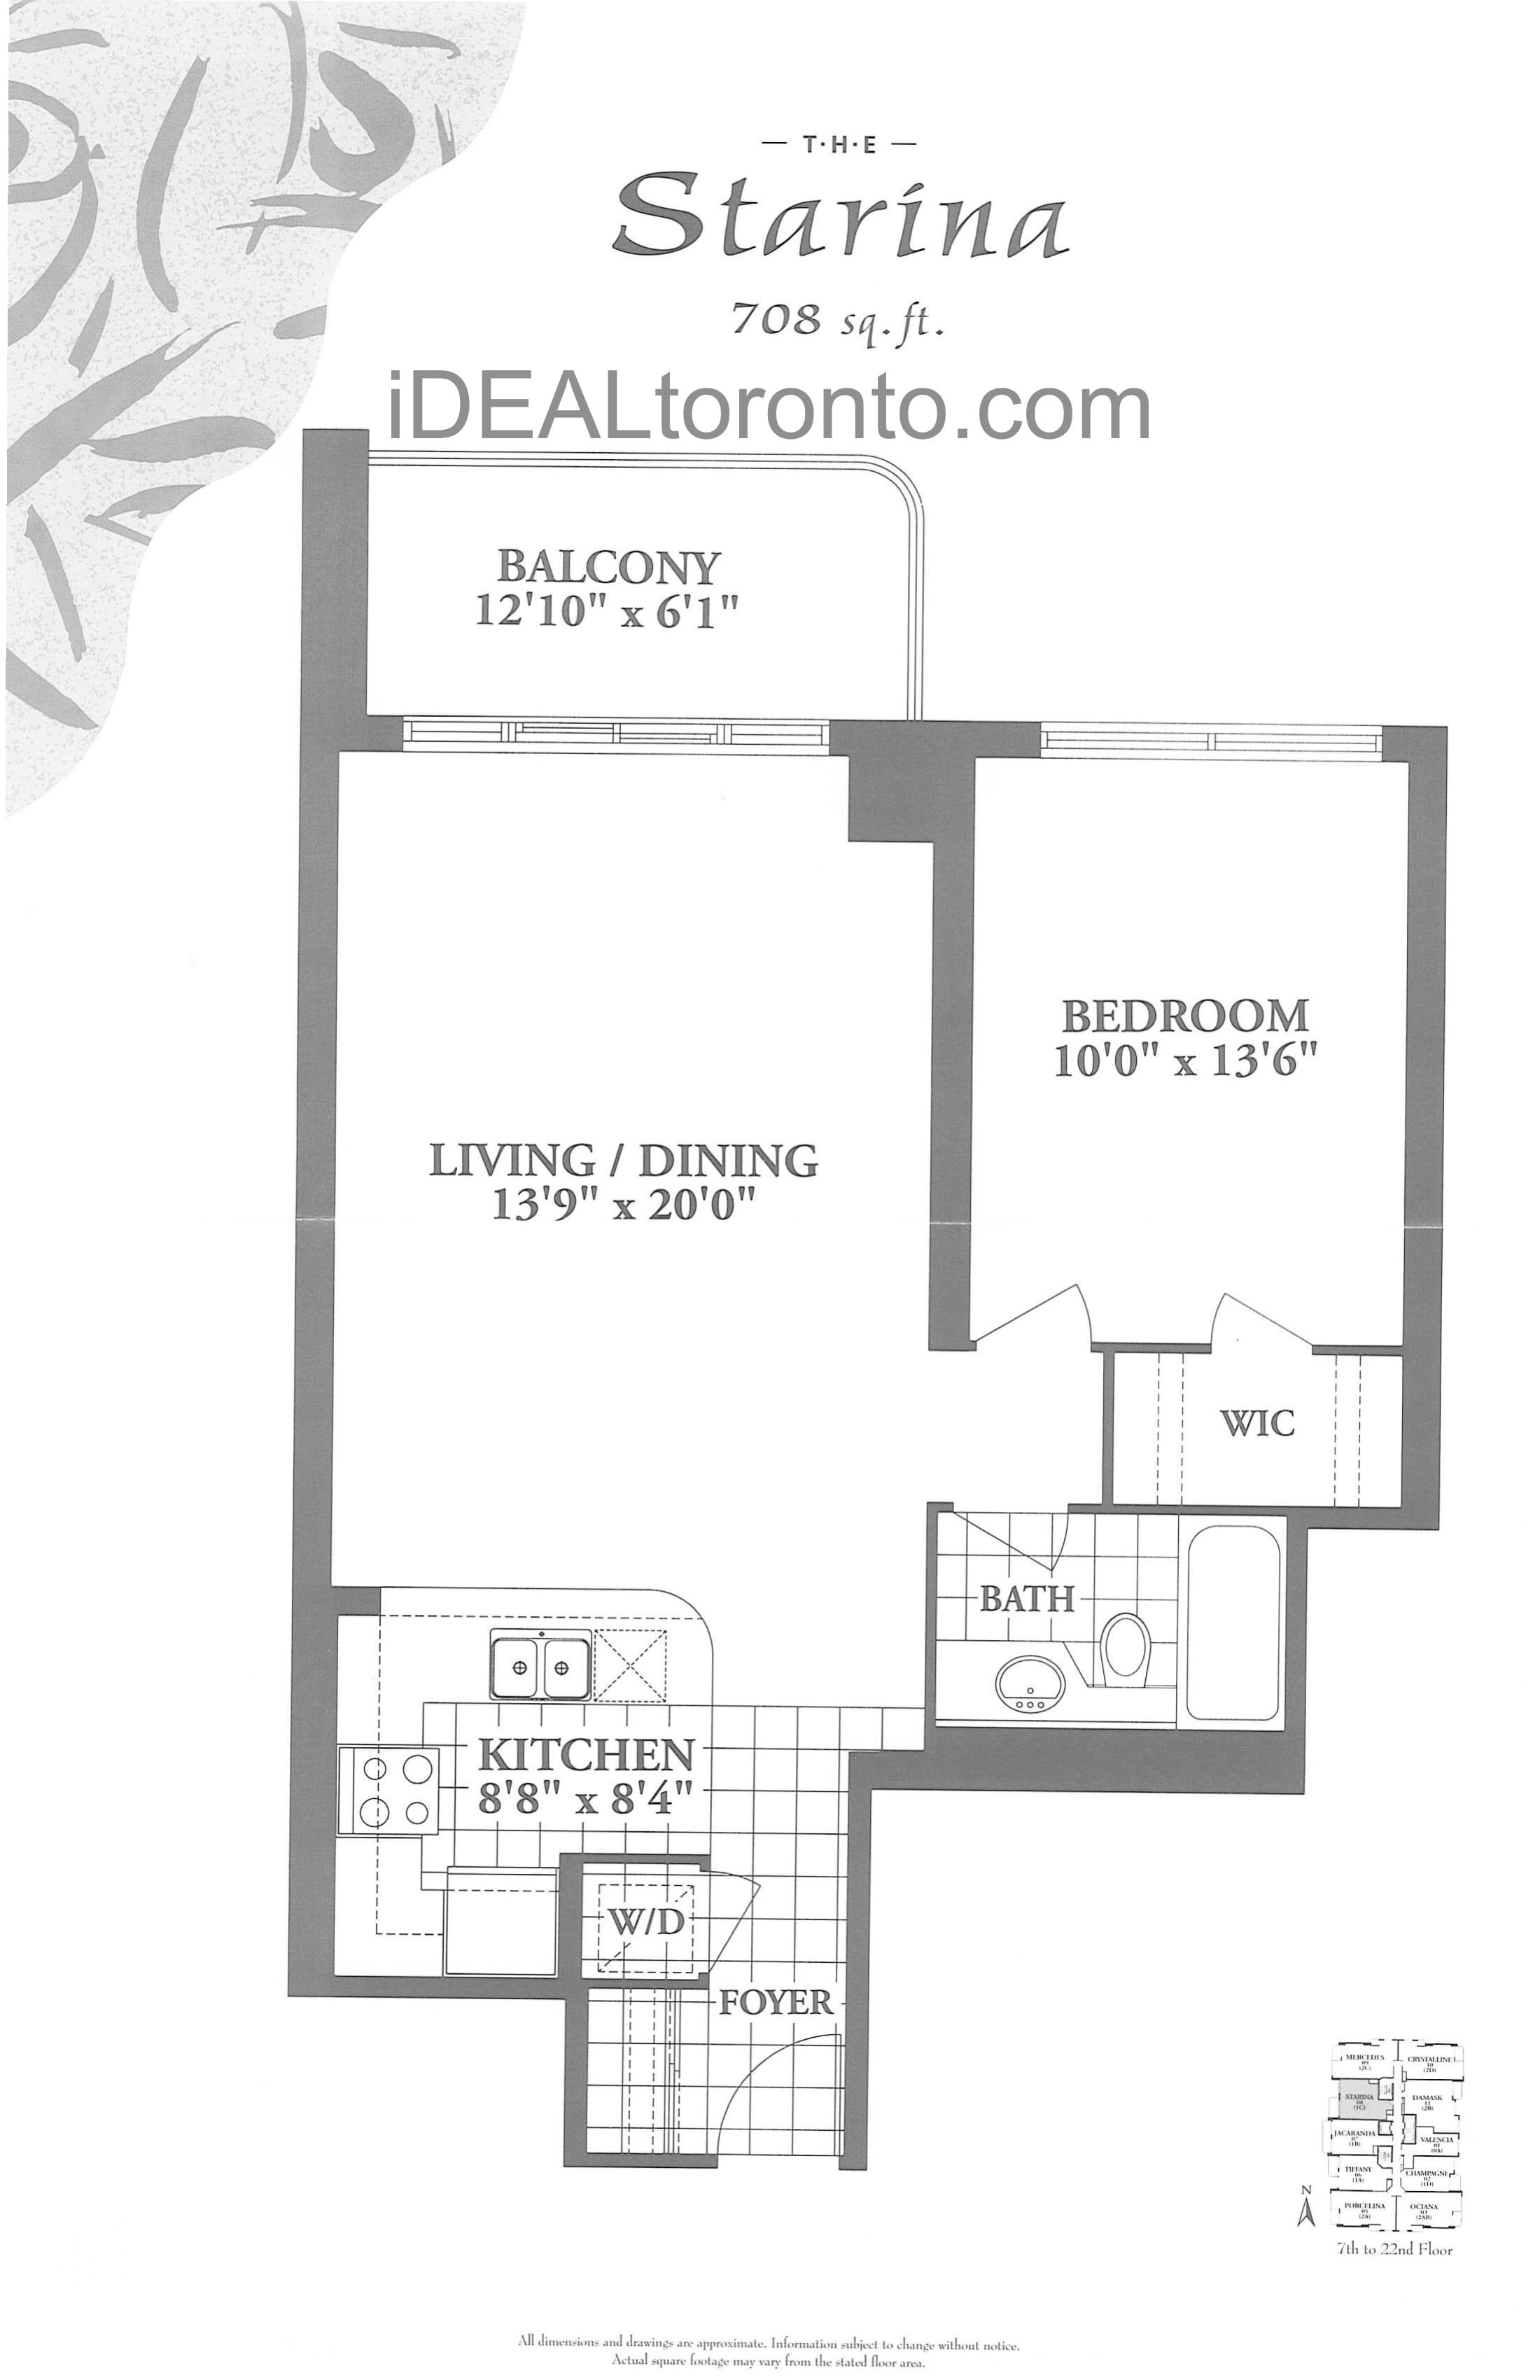 The Starina: 1 Bedroom, 708 SqFt